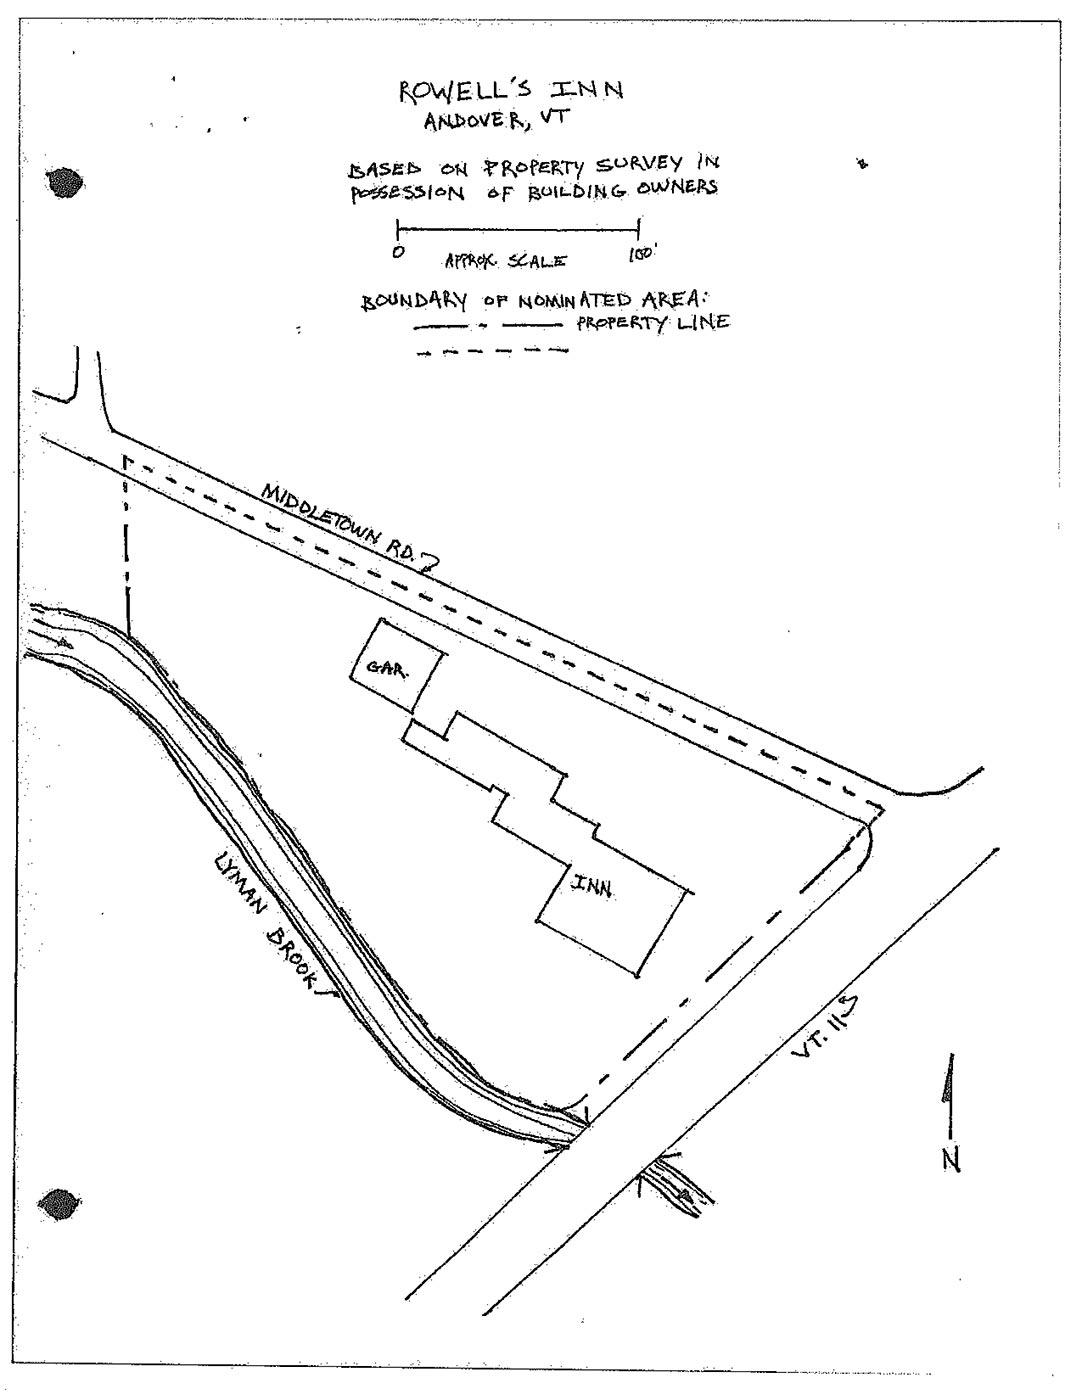 Rowell's Inn Historic Designation